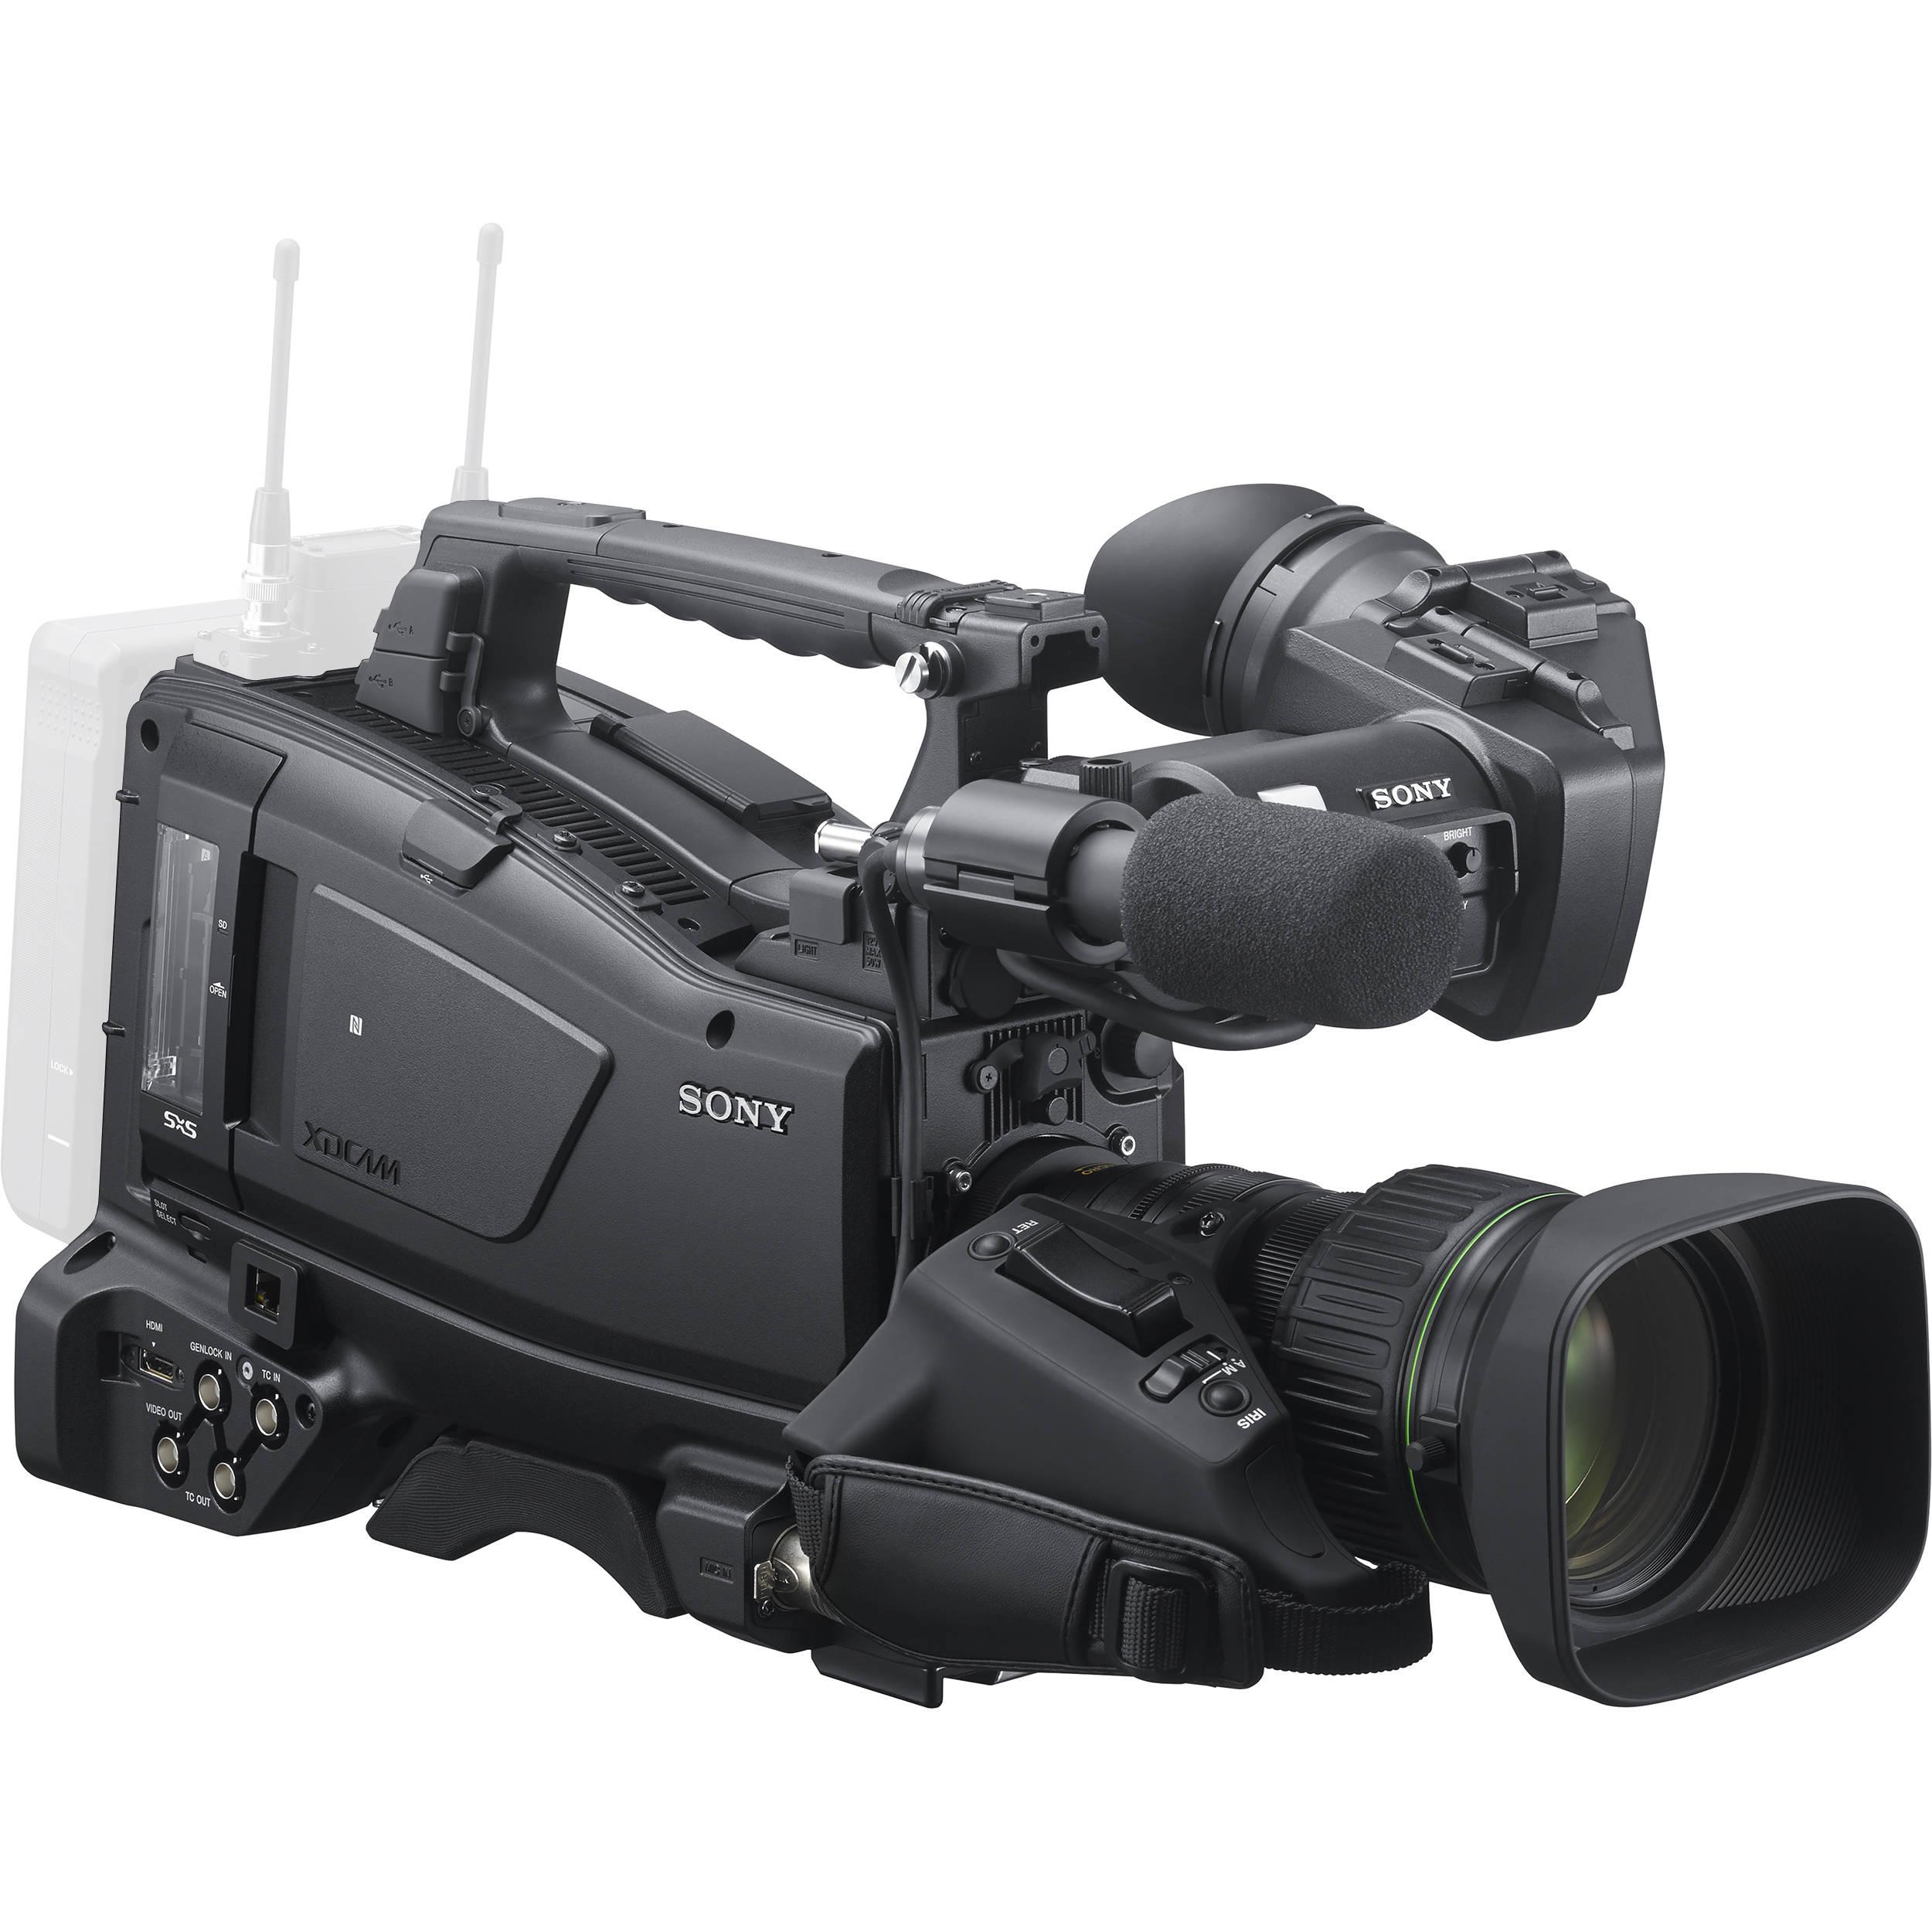 sony handycam manual focus